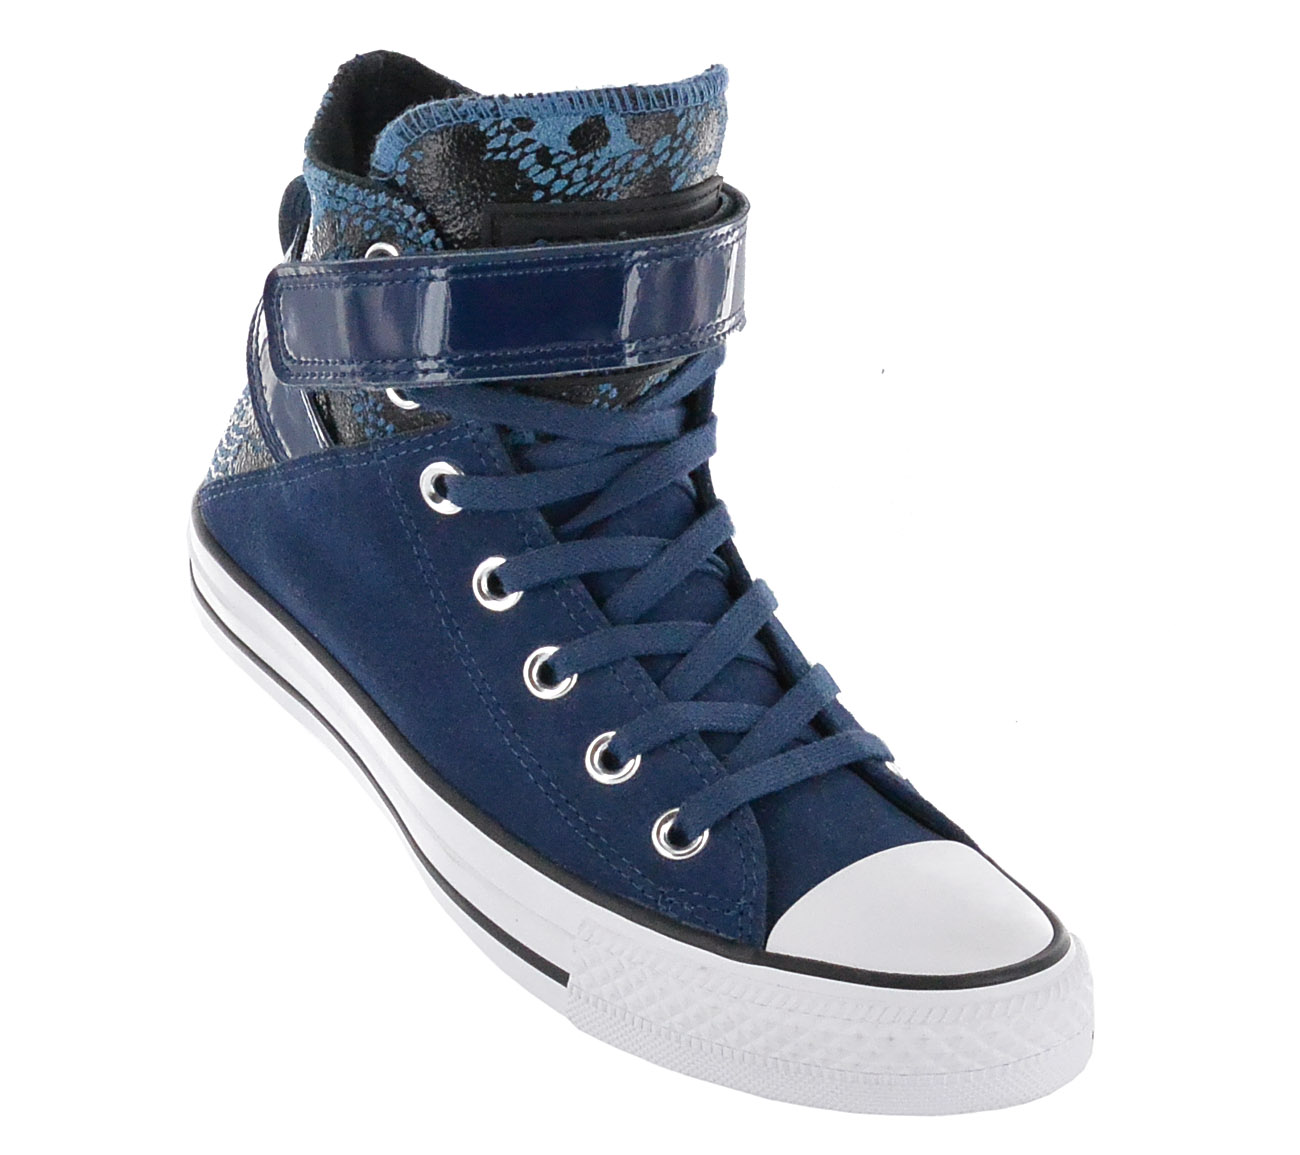 25725e5a6ceb Converse Chucks all Star Ct Brea Hi Night Leather Women s Shoes Blue ...